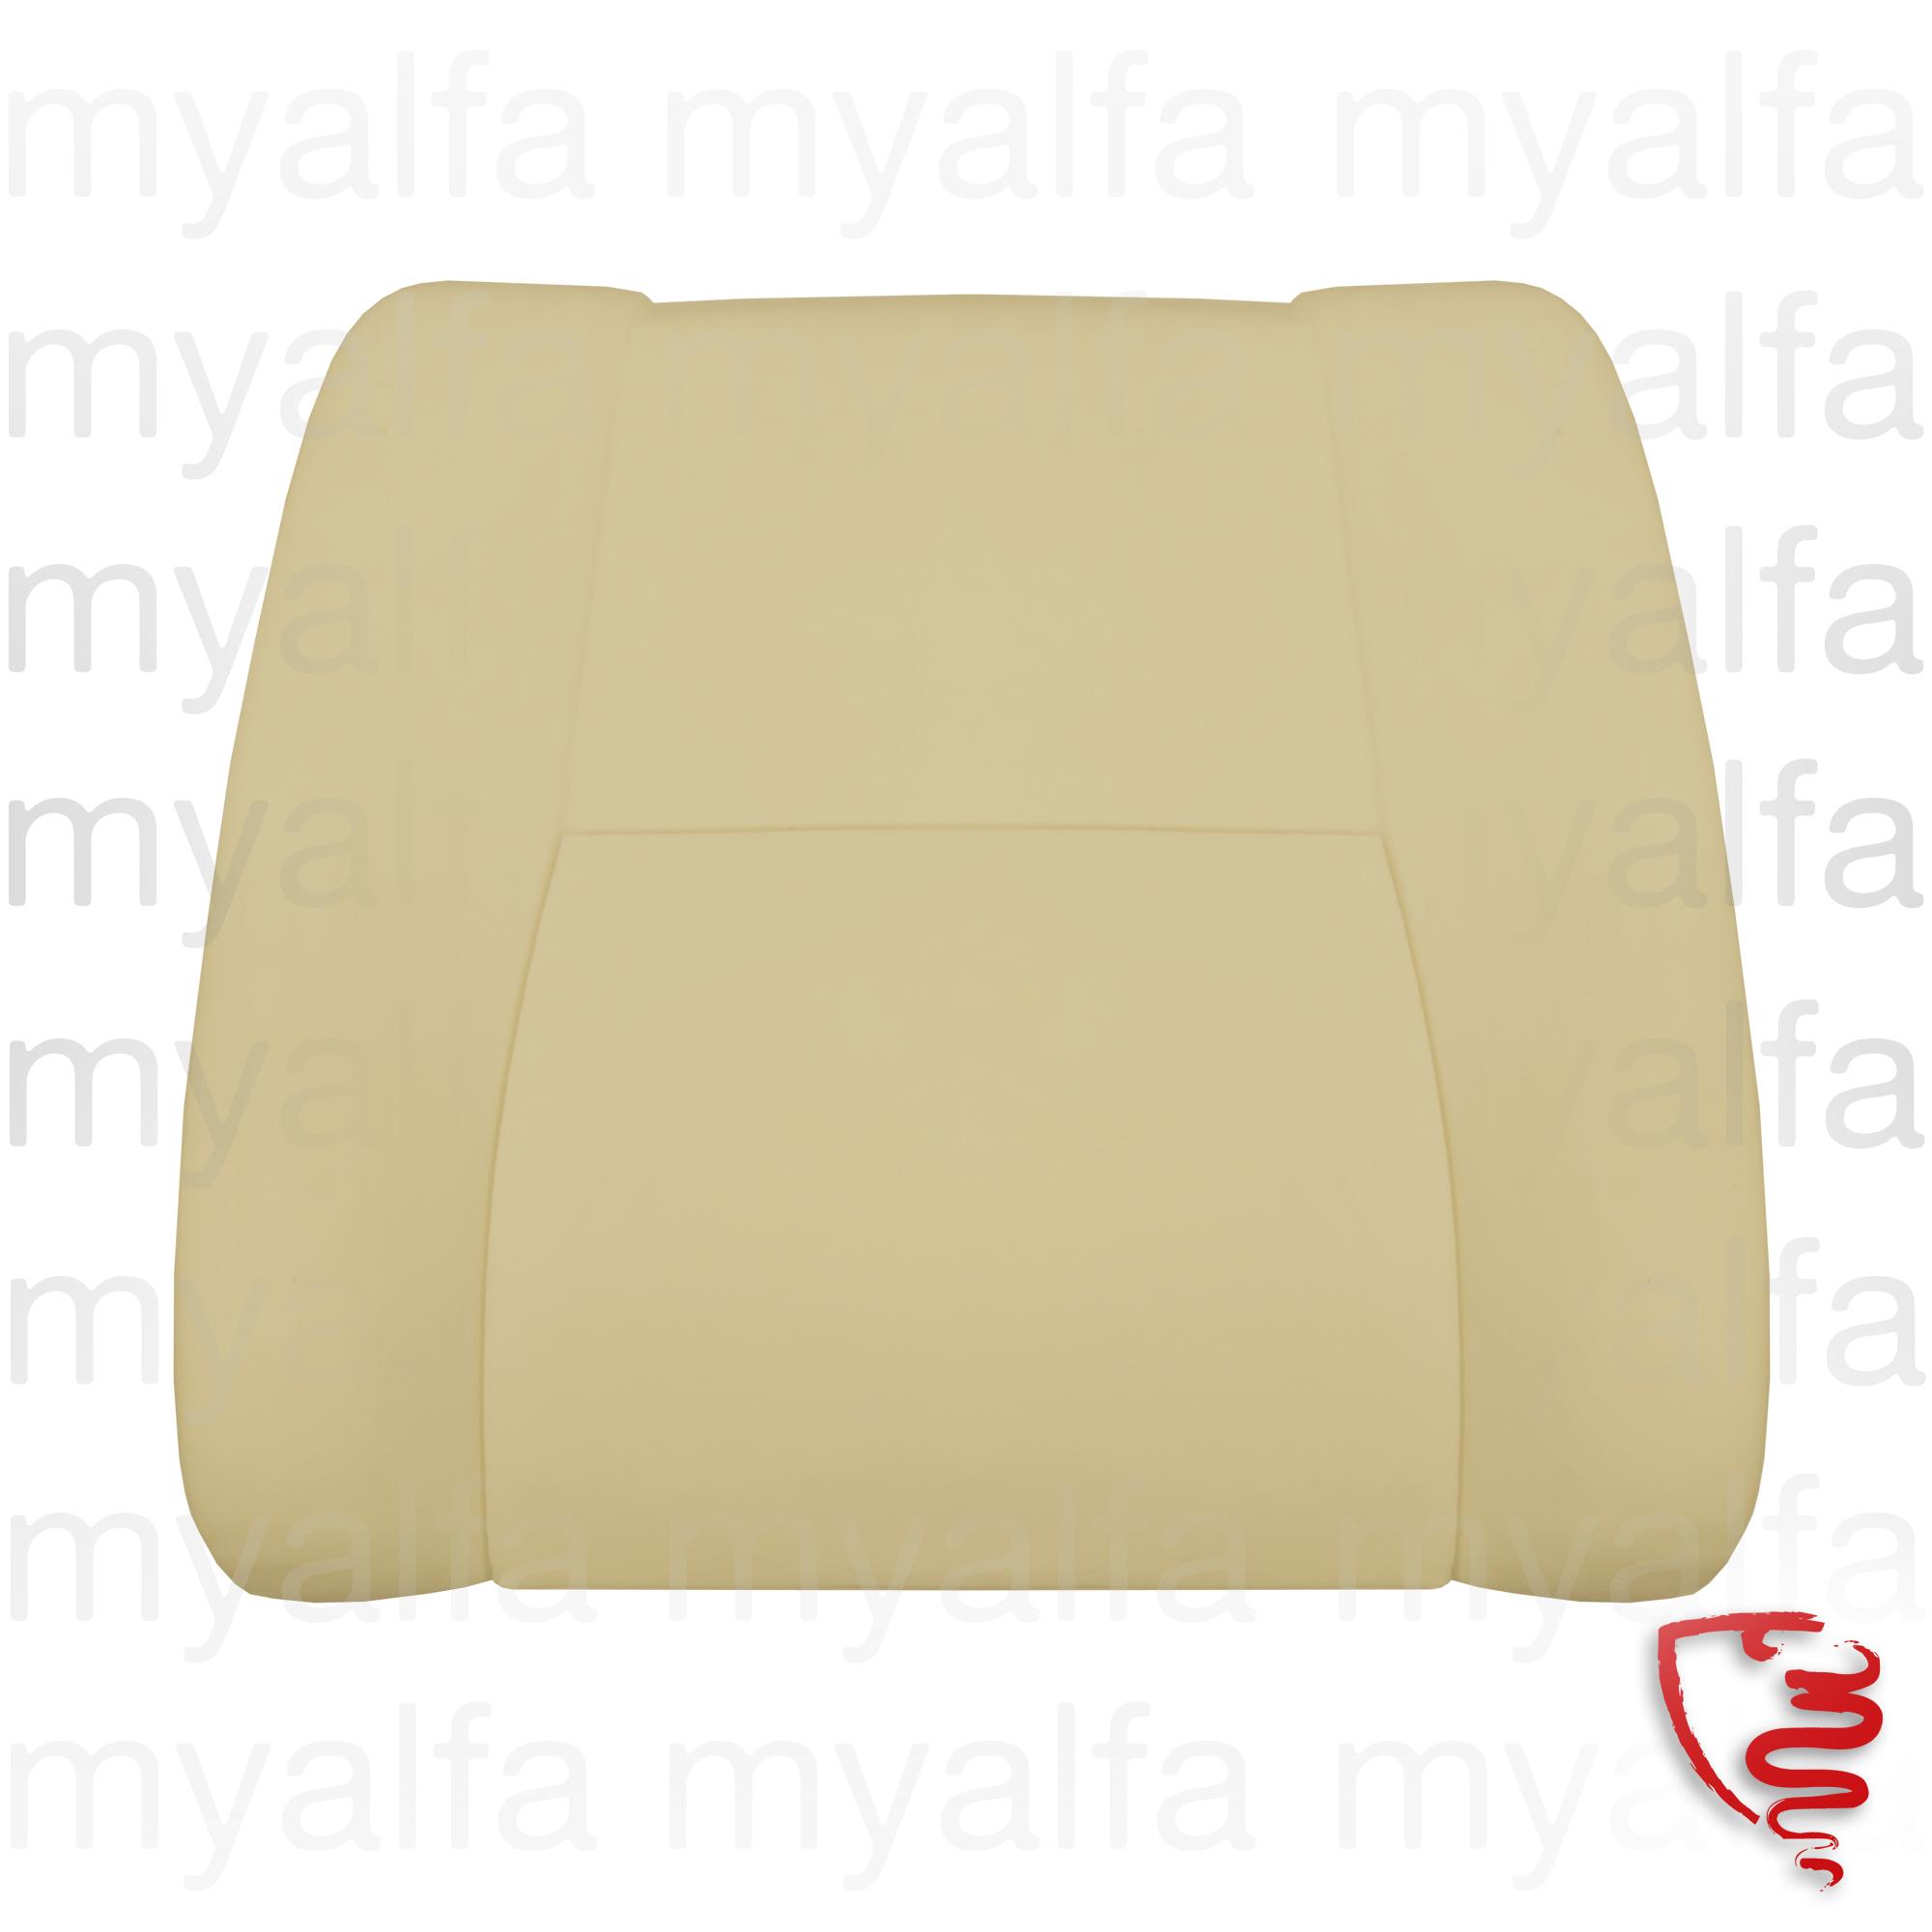 backrest foam for seat Bertone for 105/115, Coupe, 1750, 2000, Interior, Seats, Seat foams